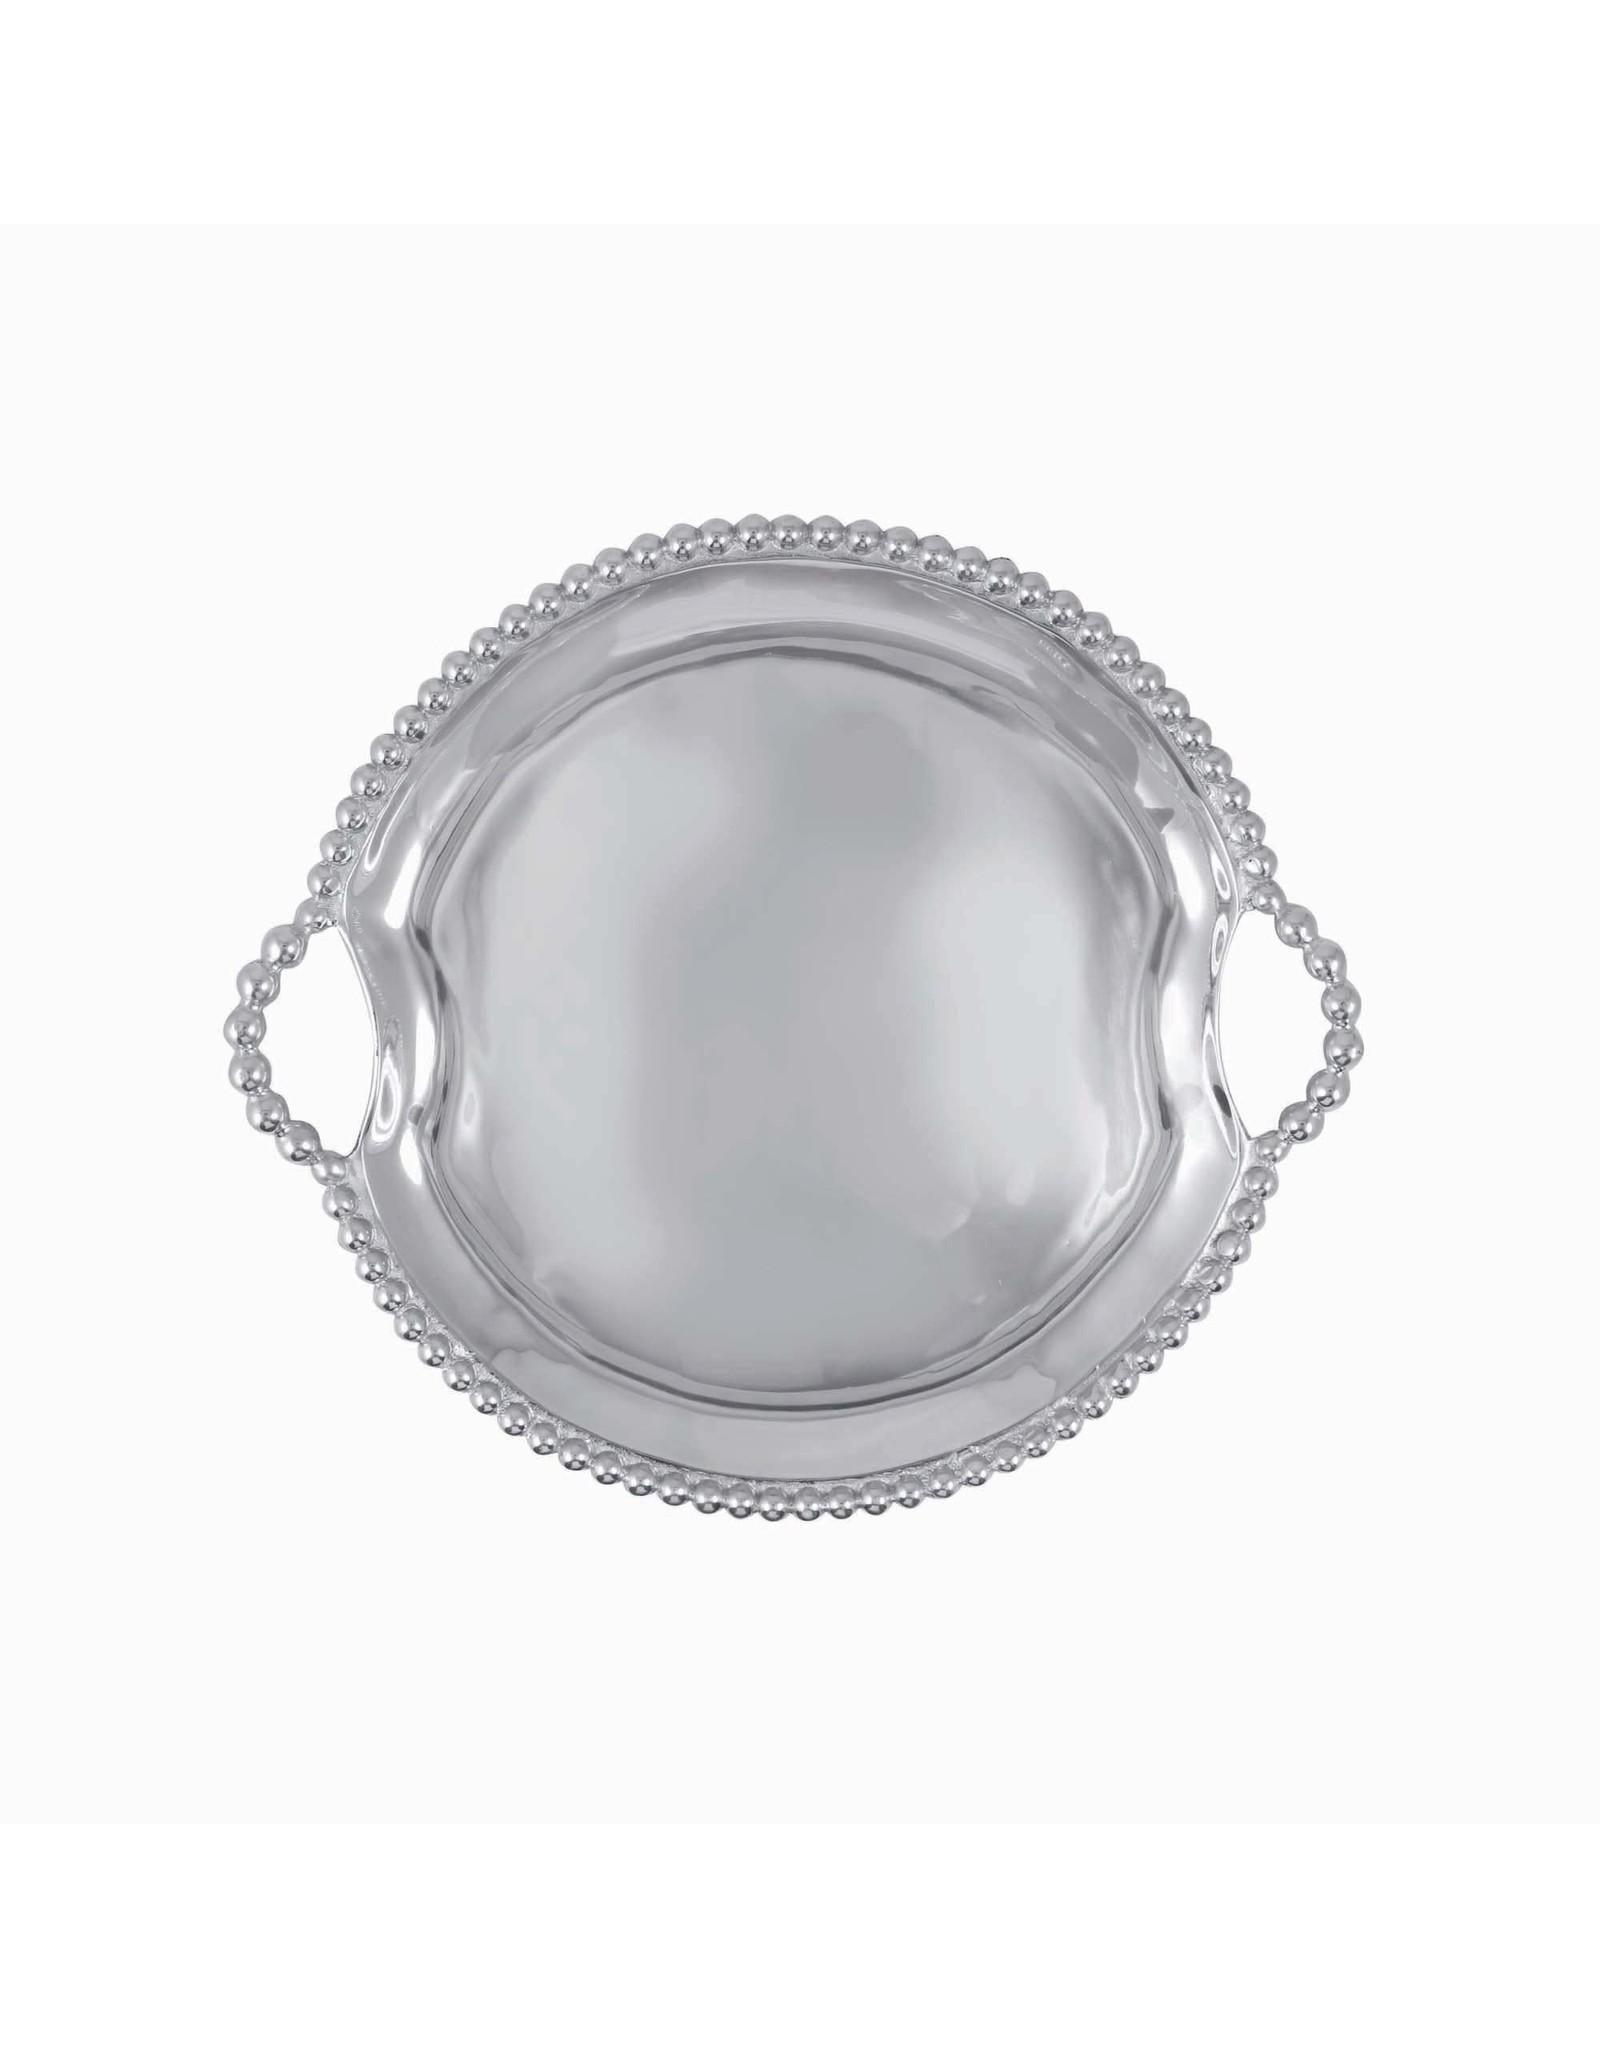 Mariposa Round Pearl HandledTray